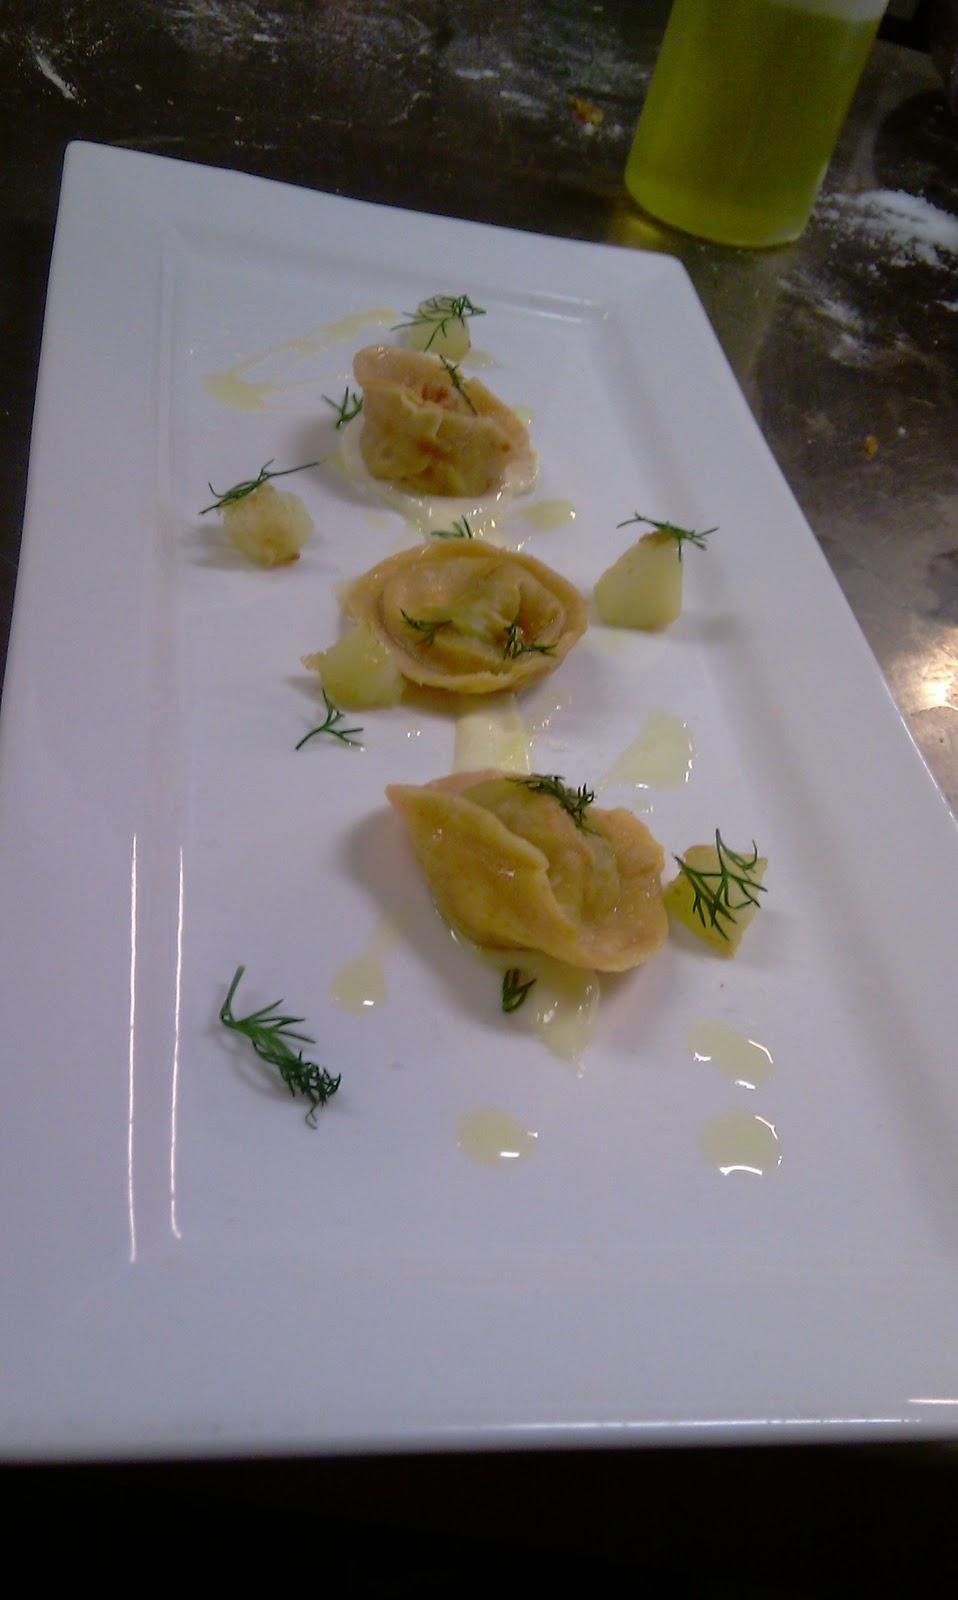 ... Goat Cheese. On Lemon Aioli with Patatas Bravas and Fresh Dill